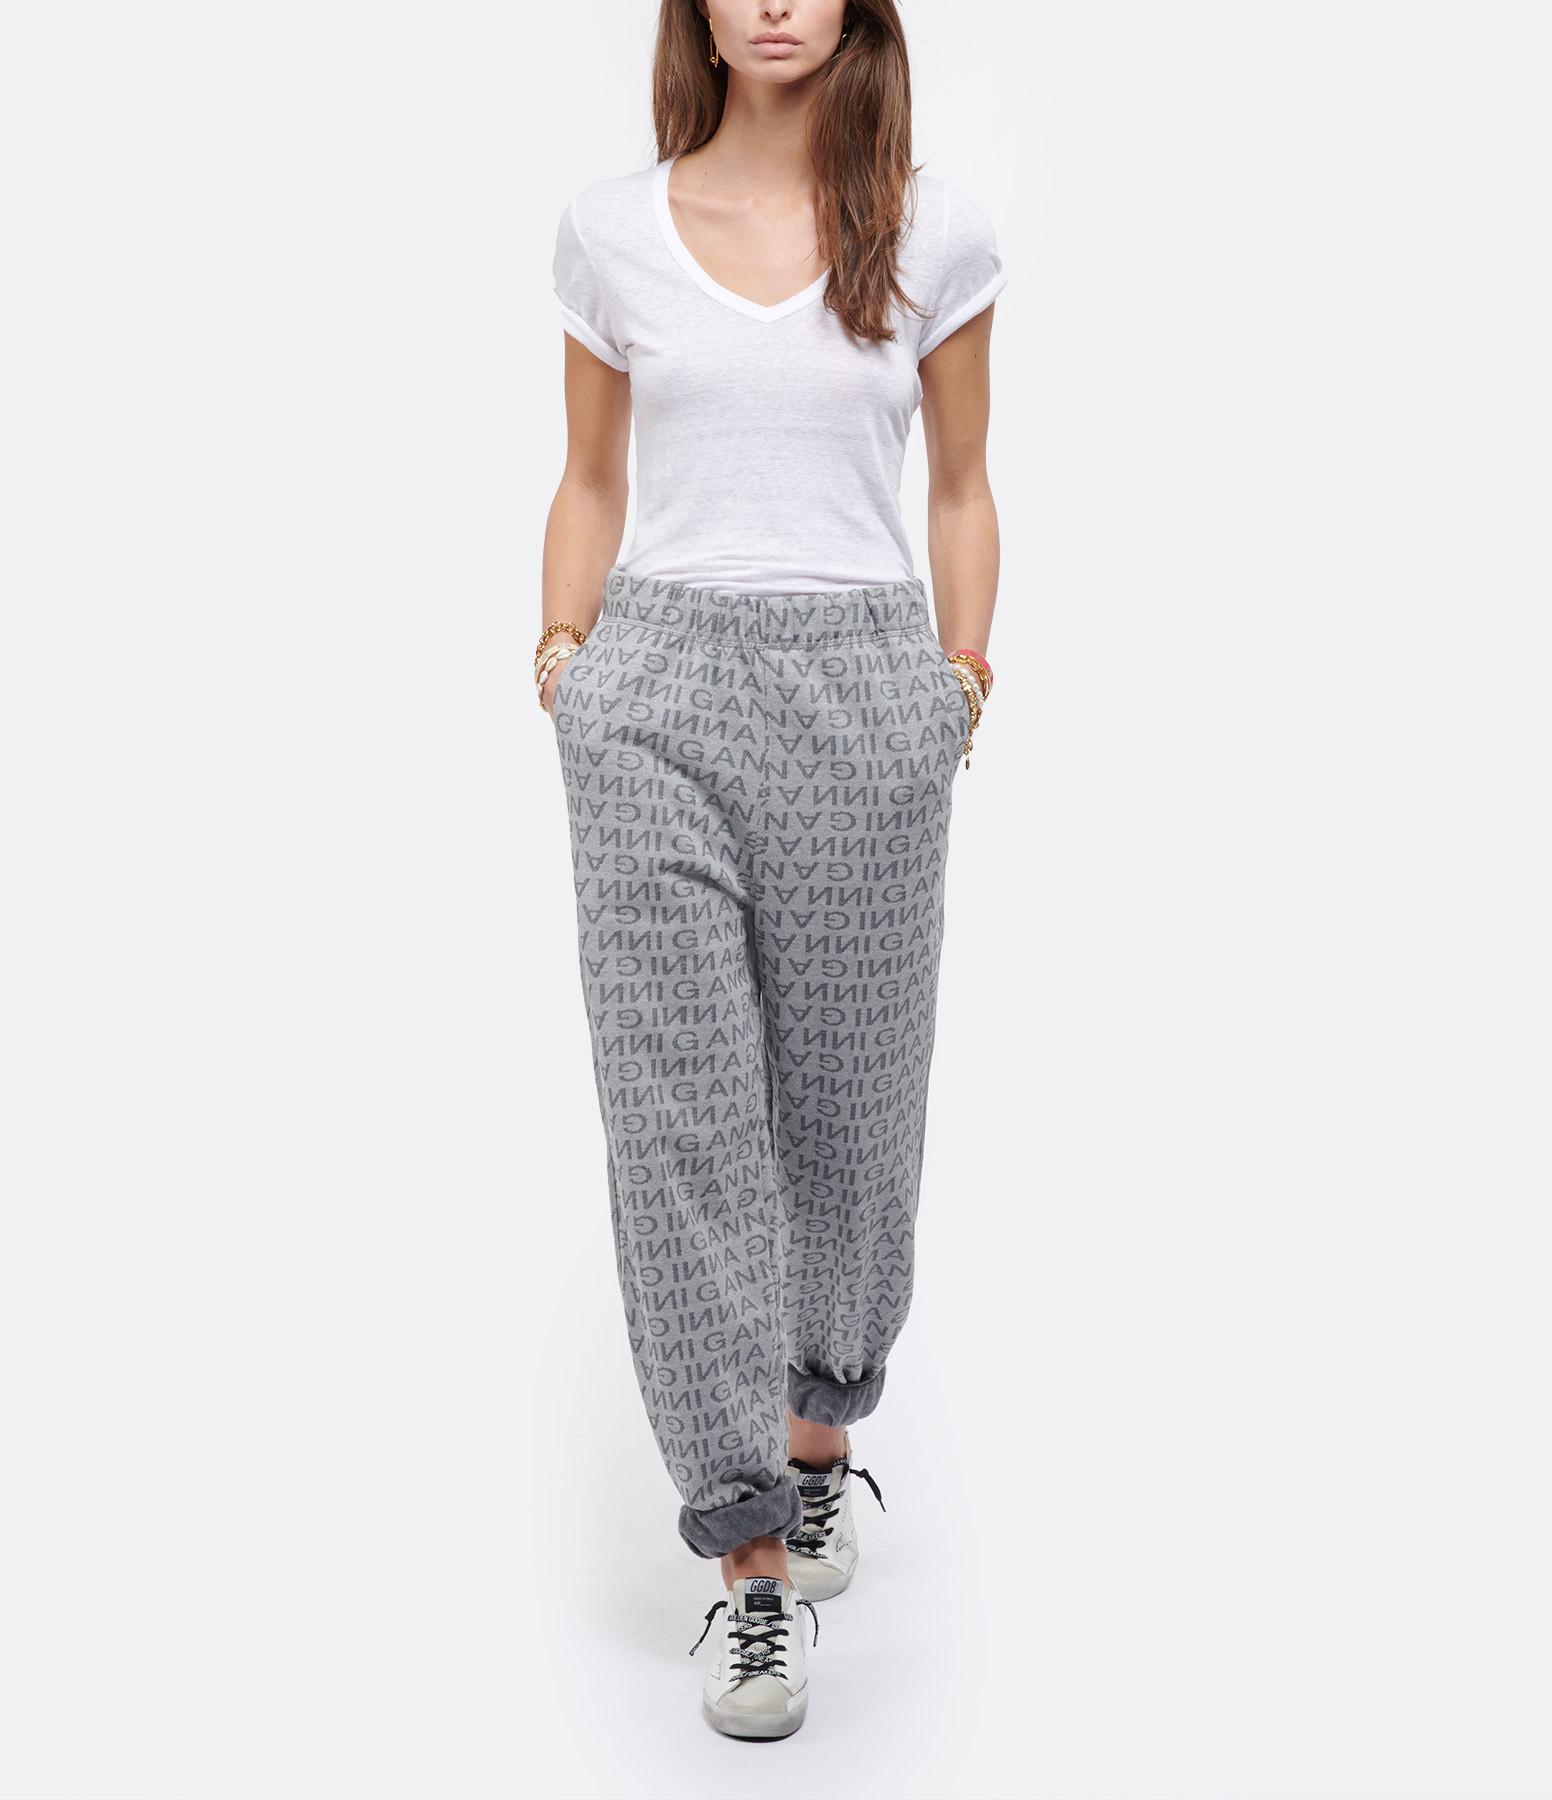 ISABEL MARANT ÉTOILE - Tee-shirt Kranger Lin Blanc